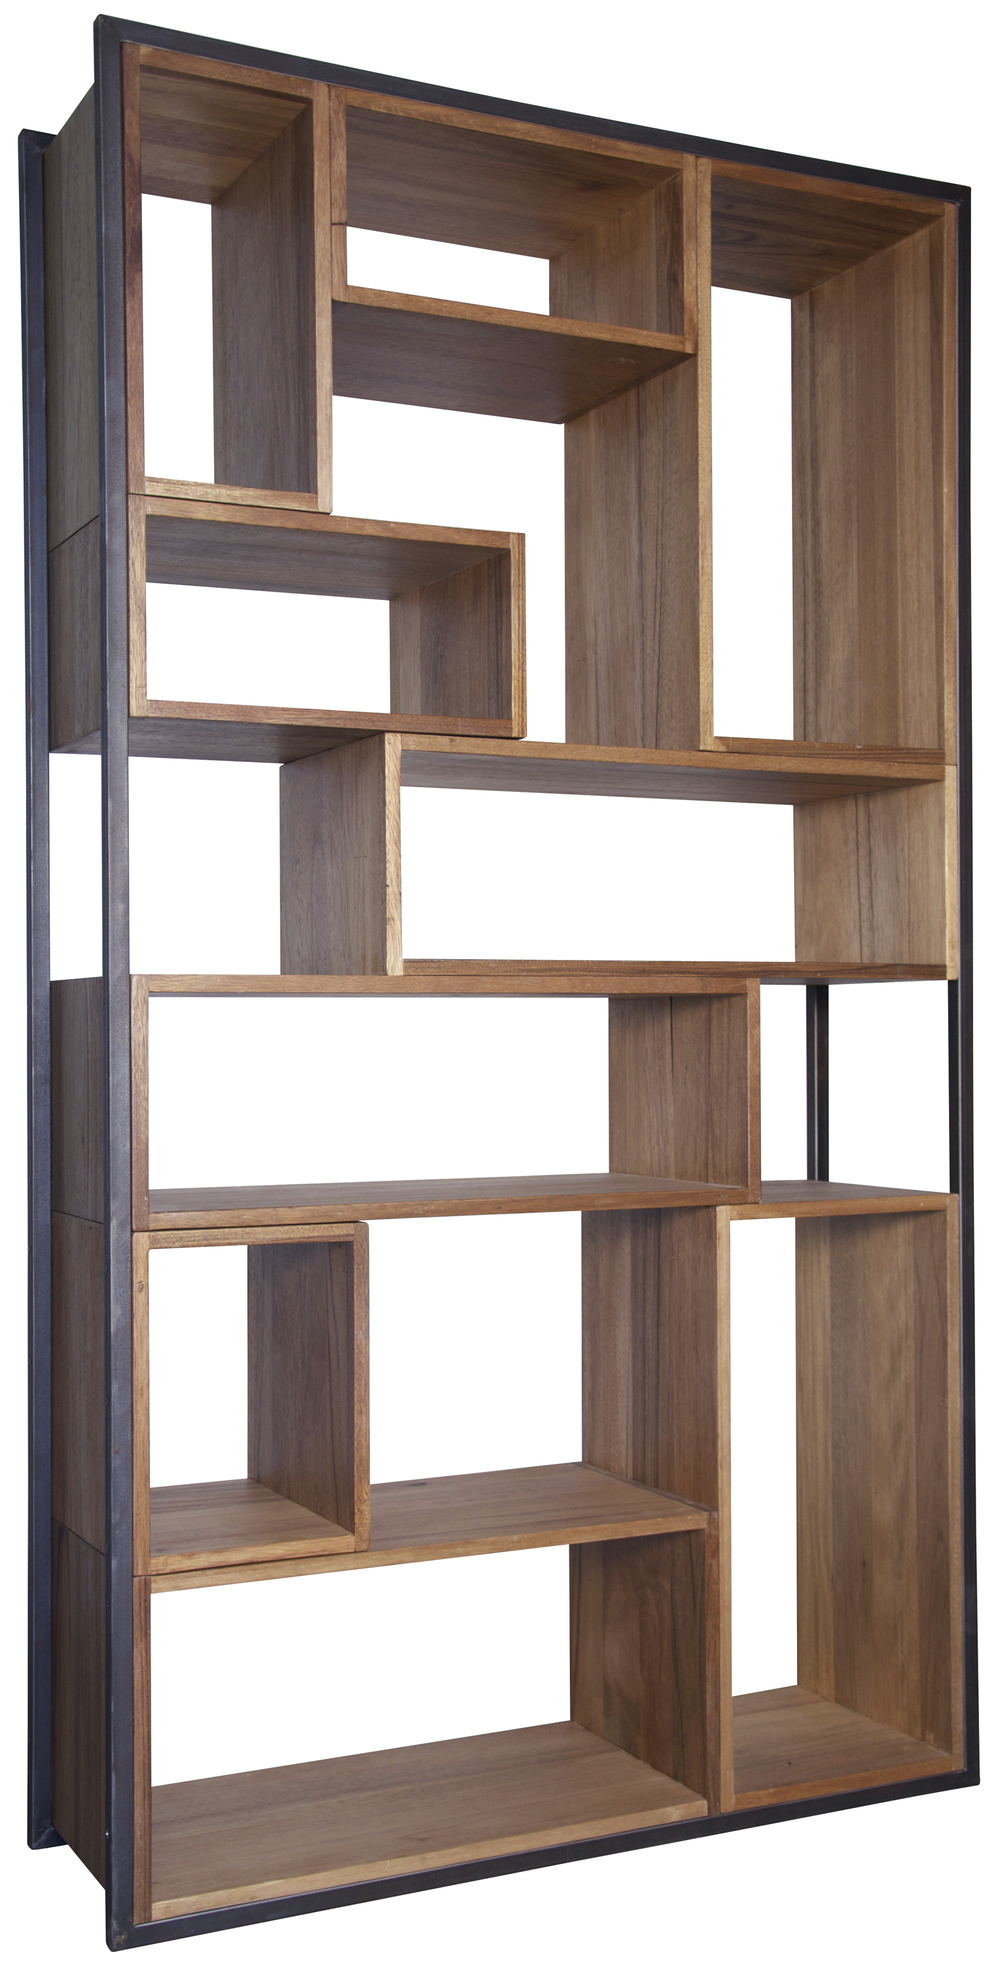 Noir Trading - Bauhaus Bookcase